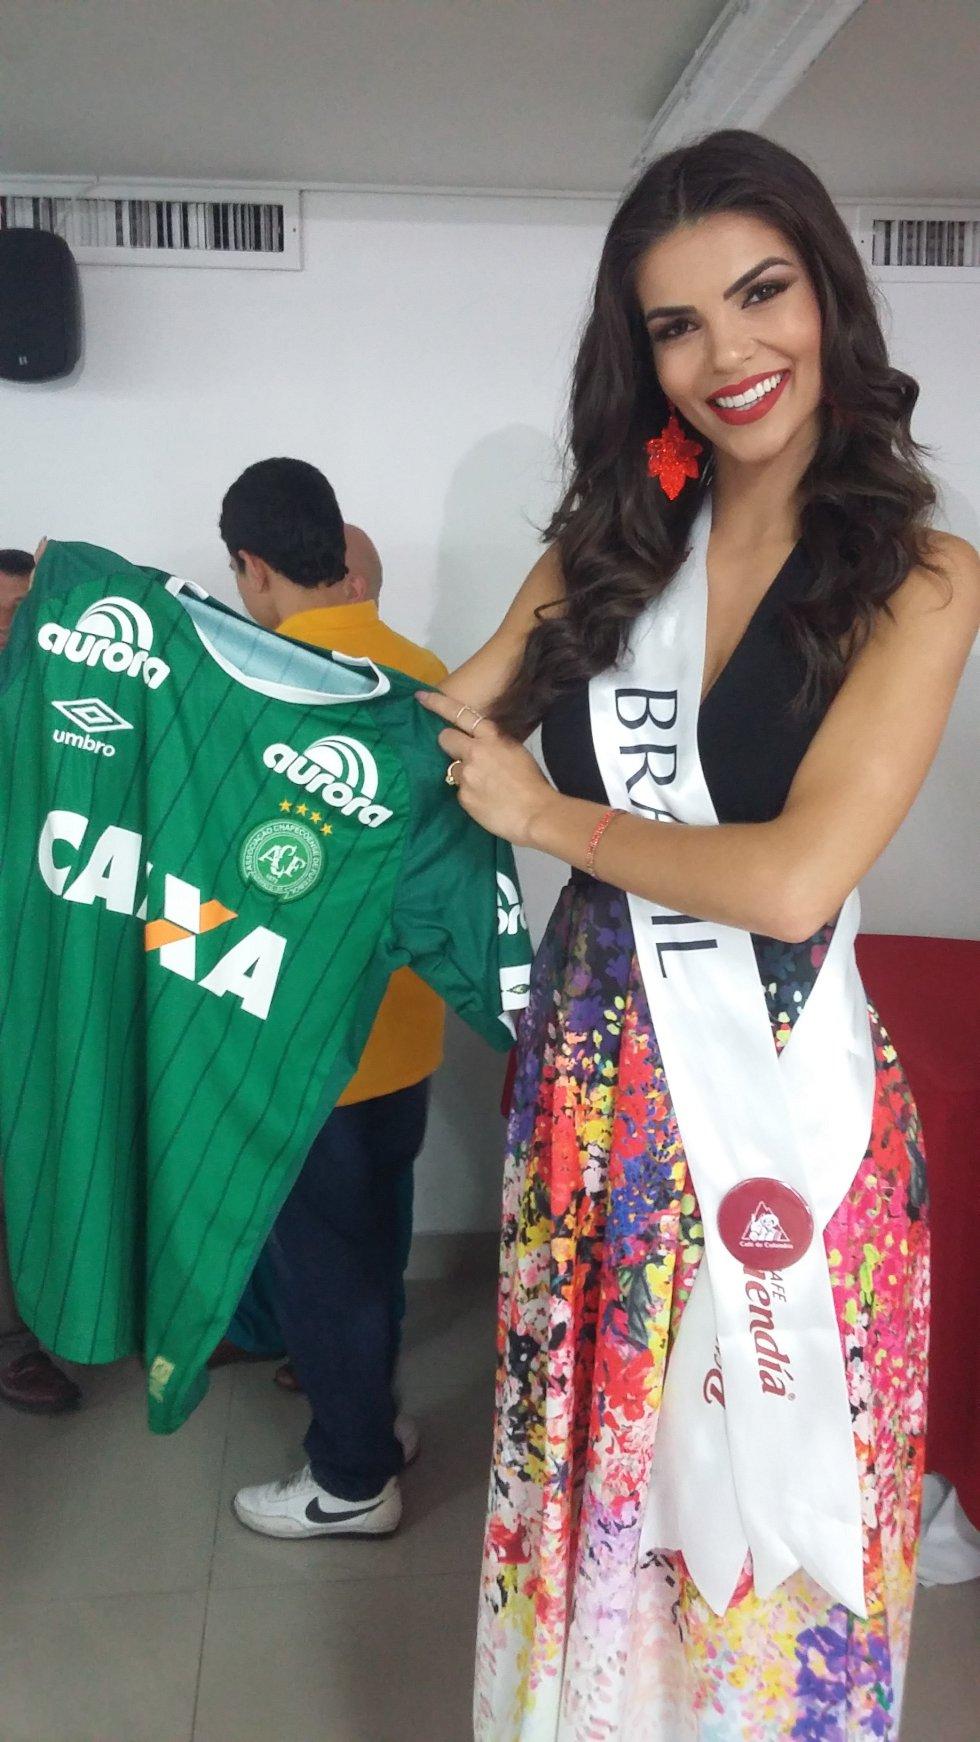 MISS ASIA PACIFIC INTERNATIONAL 2017/MISS PANAMERICAN INTERNATIONAL 2018. - Página 3 Lqlroak7